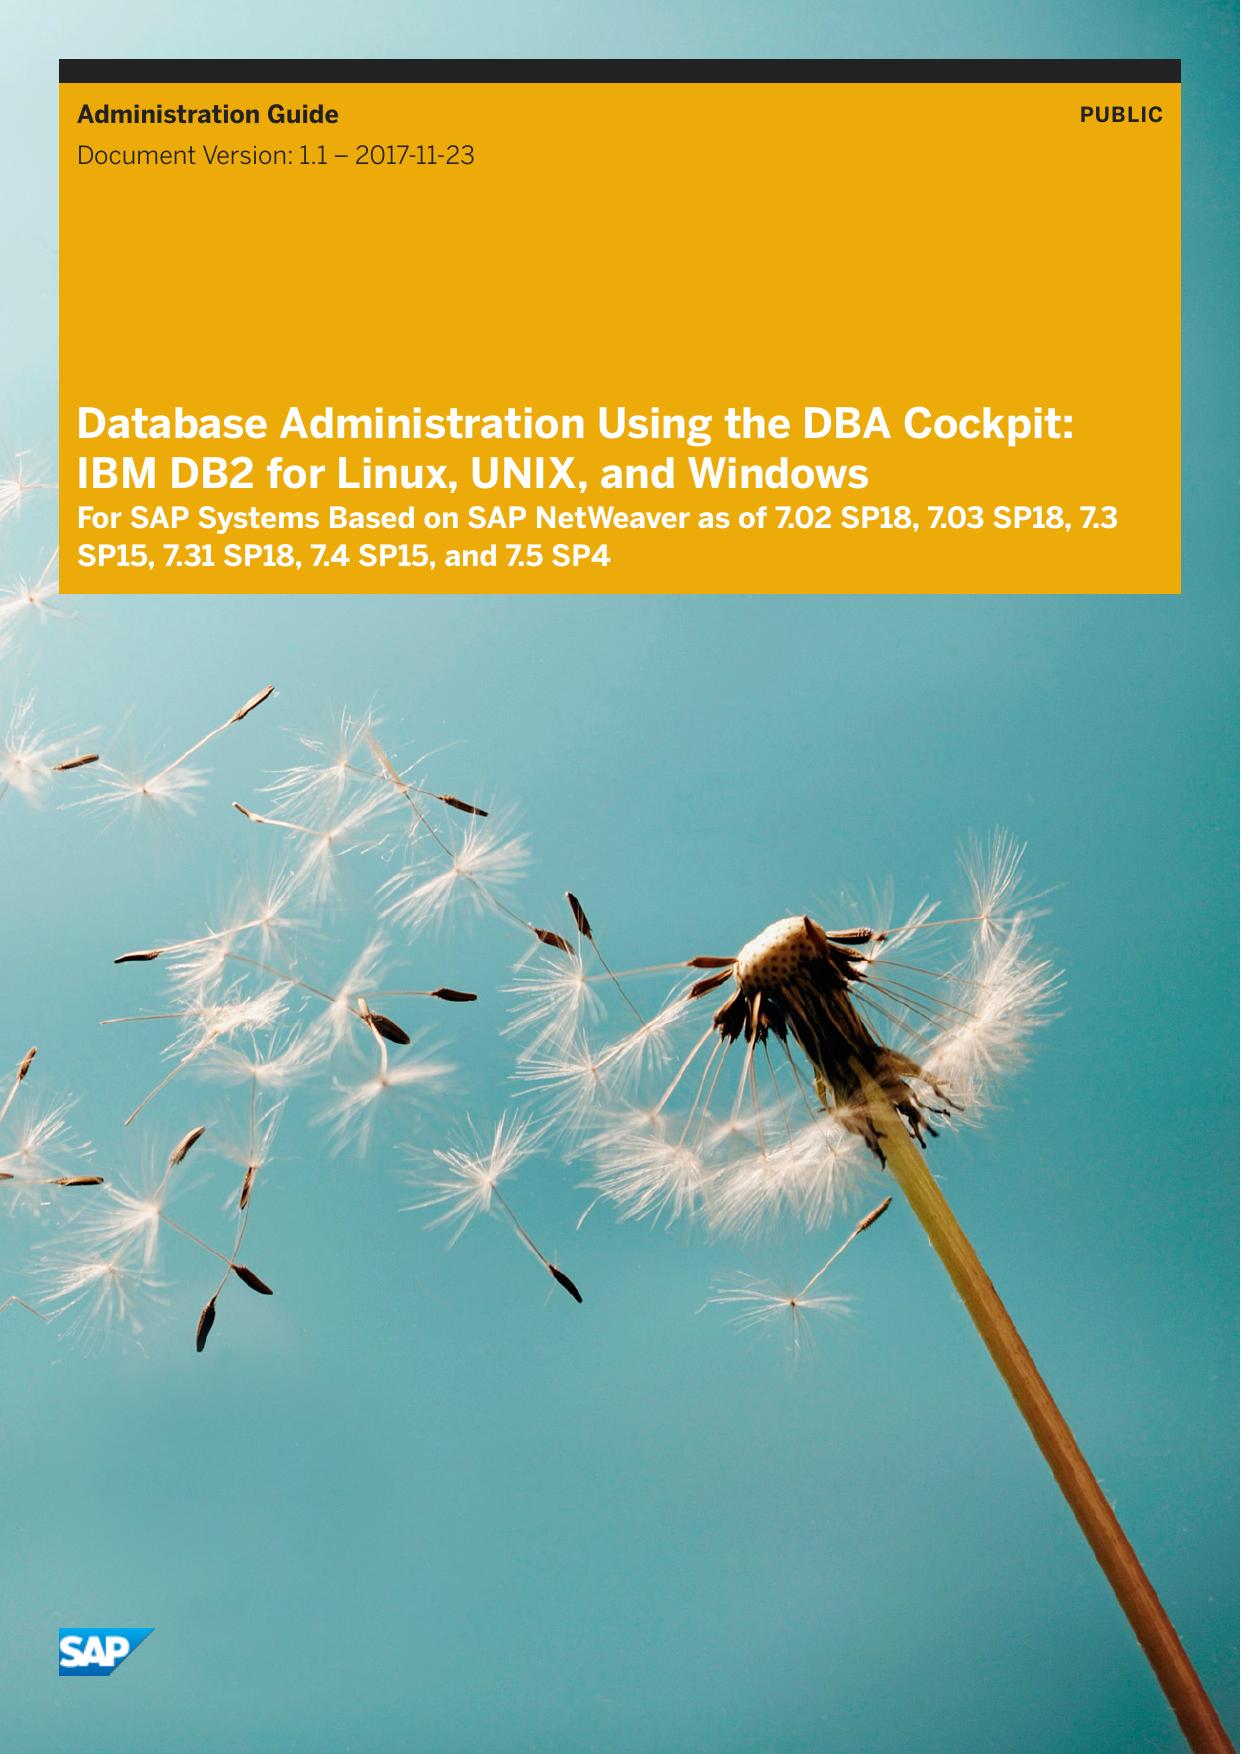 Database Administration Using the DBA Cockpit | manualzz com